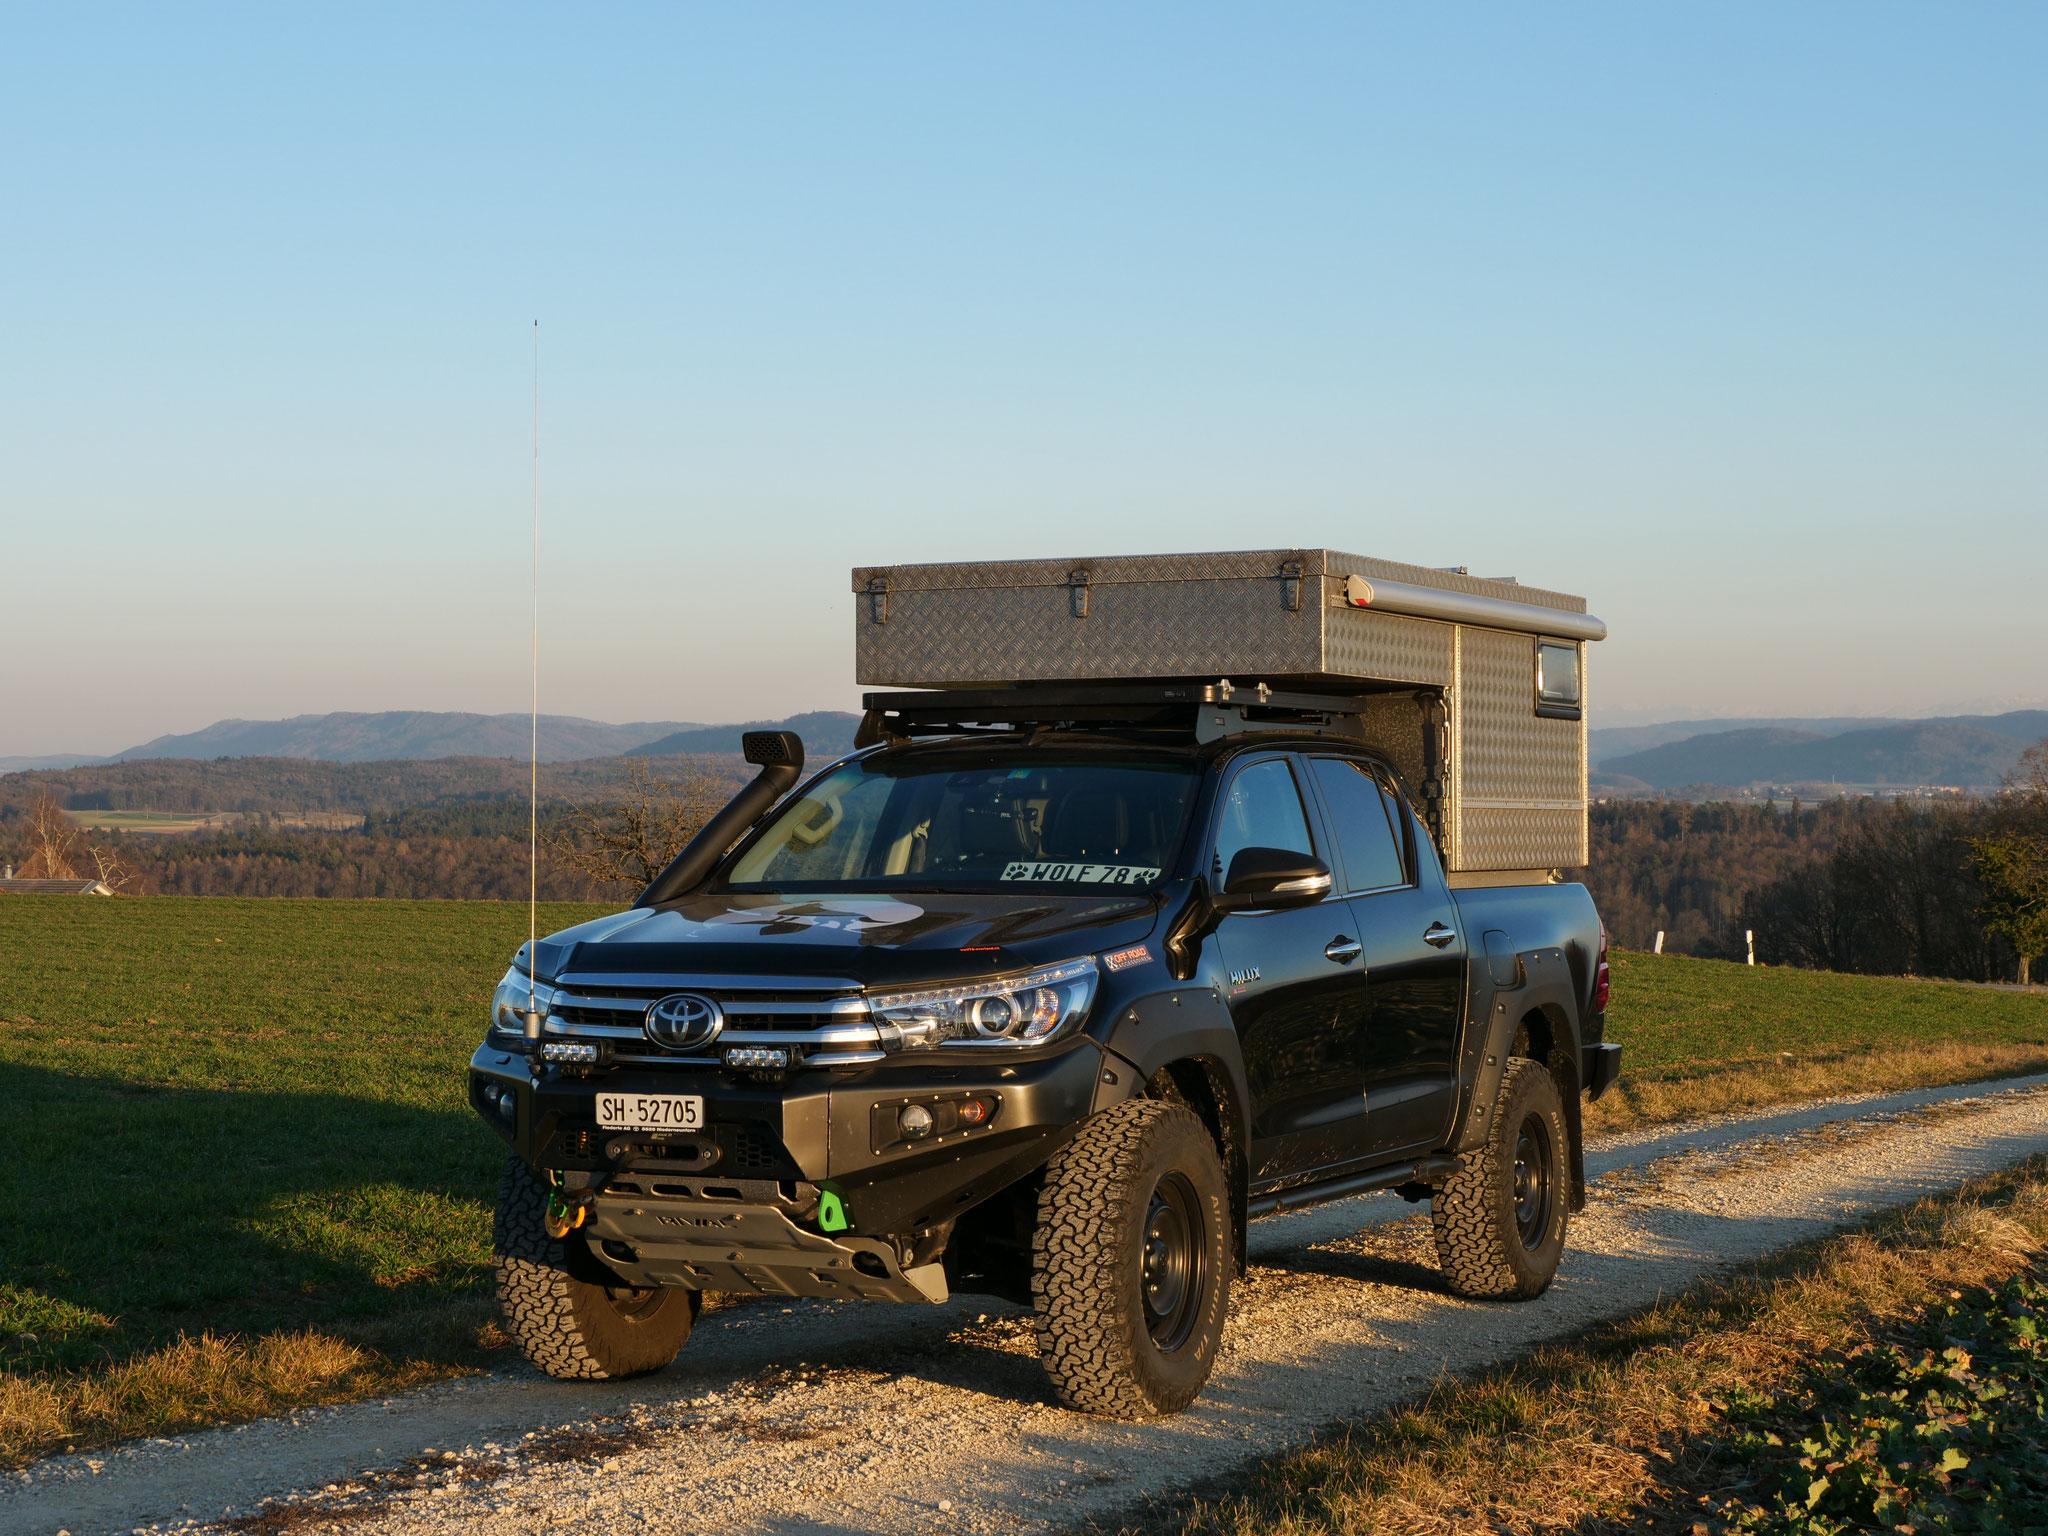 "Truckcamper Wohnkabine Exkab 1 Toyota Hilux Revo 2017 2.4 #ProjektBlackwolf 4x4 ARB Fahrwerk Frontrunner Rocksliders Roofrack Rival skidplate  bfgoodrich 285/70R17 33"" Tires TJM Sknorkel Exkab 1 offroad Tacoma expedition overland wolf78-overland.ch"